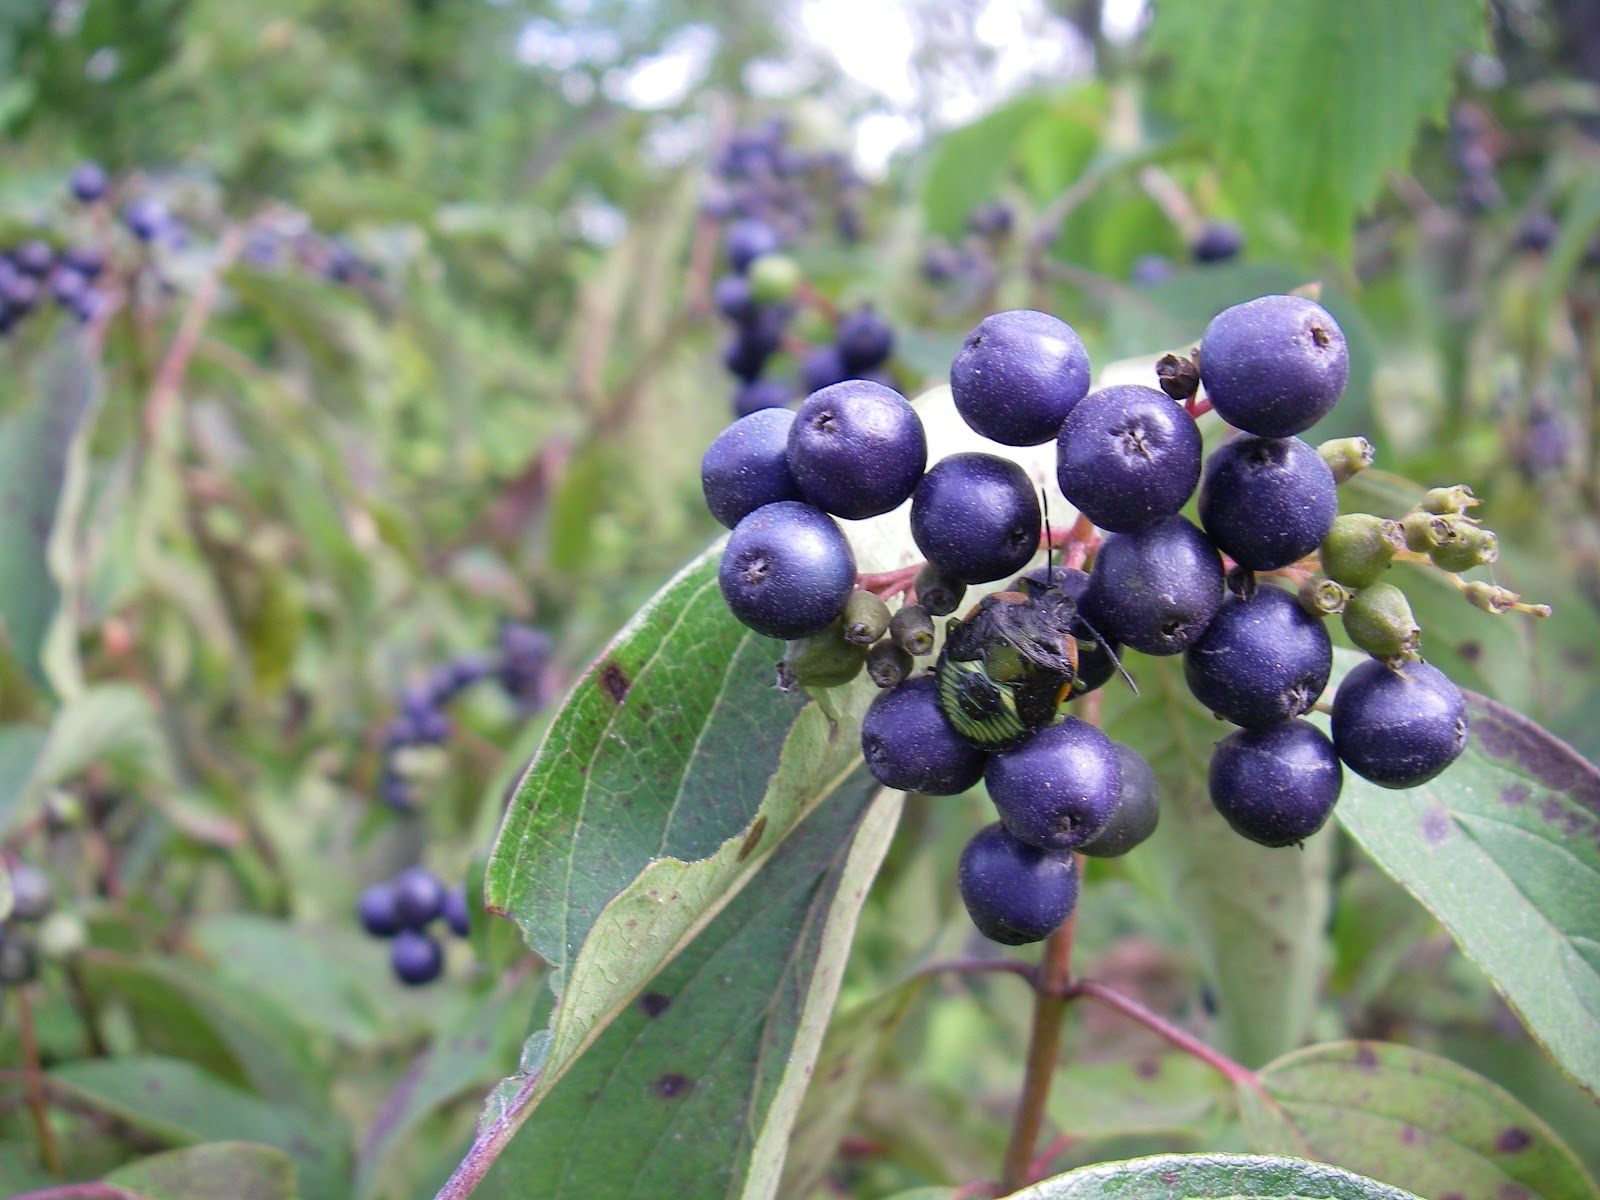 Wildlife Monitor Wild Berry Identification